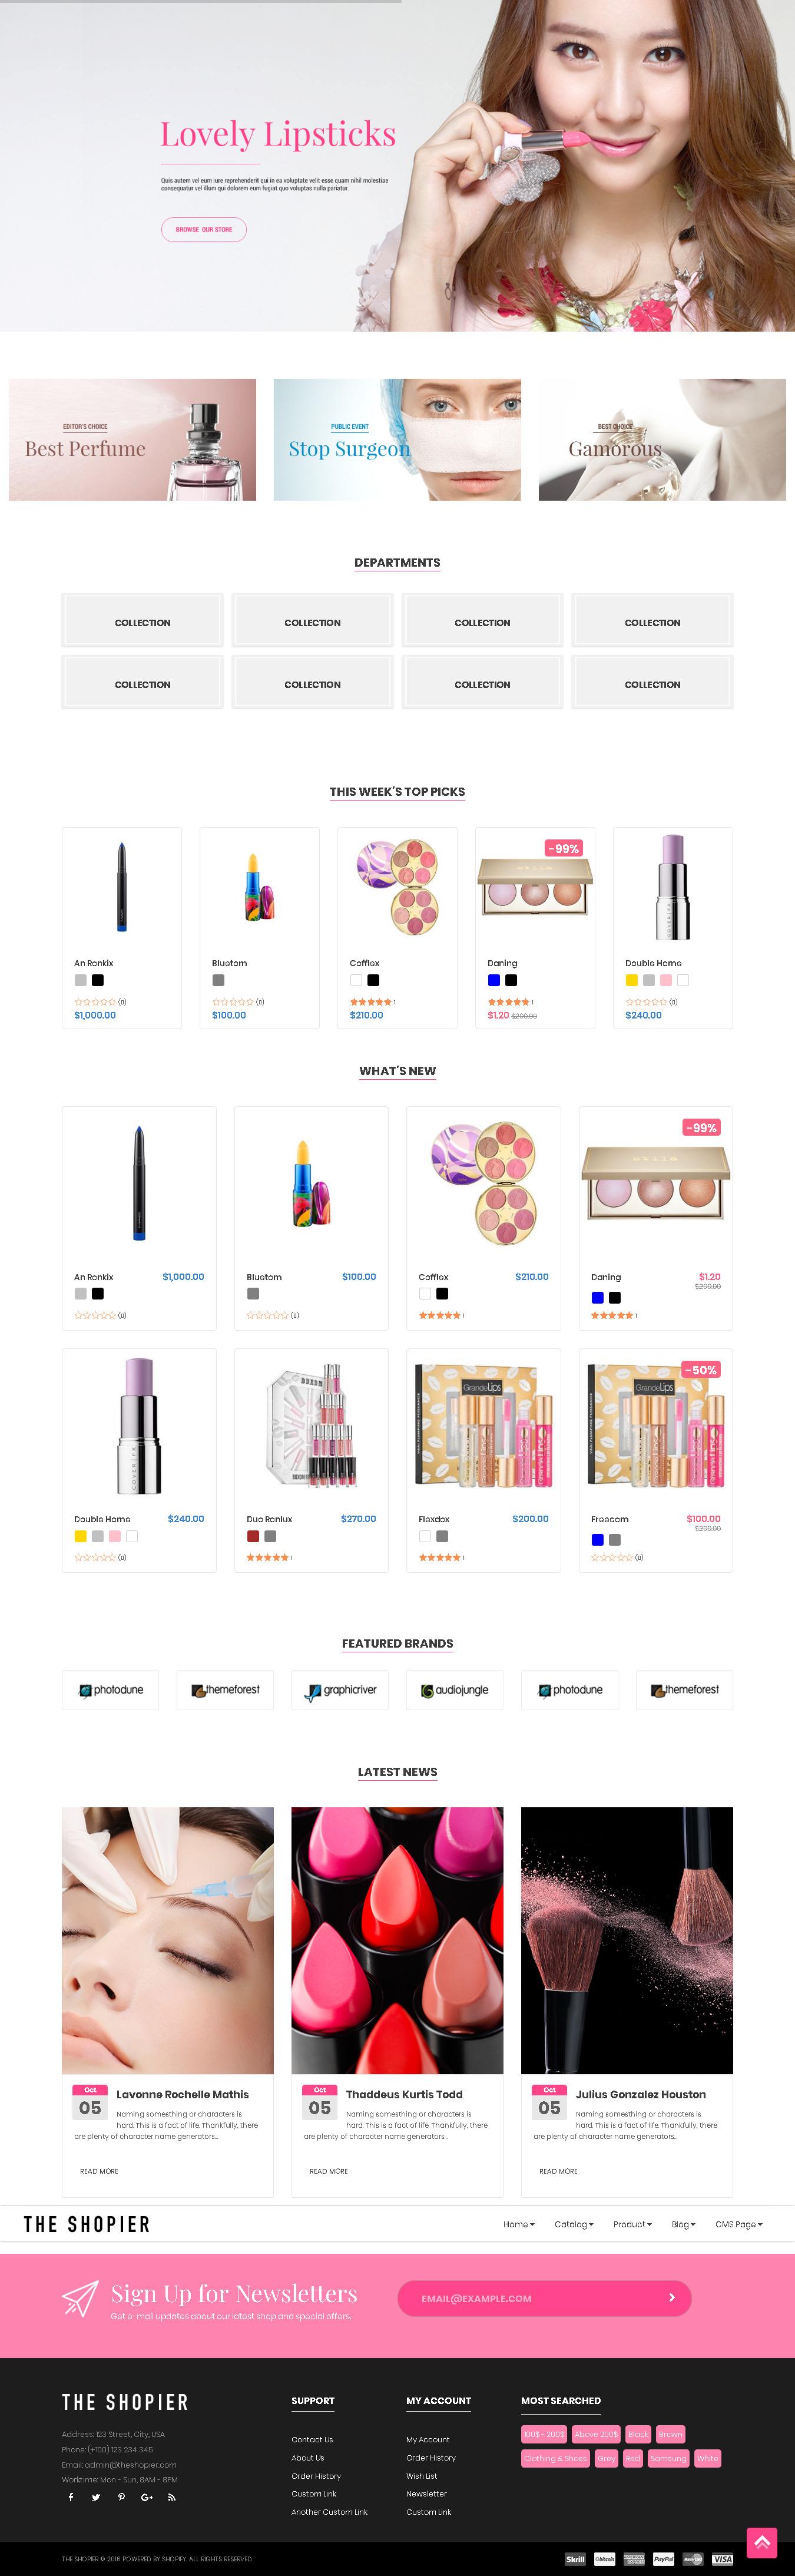 Top Shopify themes for Cosmetics Store - SHOPIER - Creative Multi-Purpose Shopify Theme - Fashion,Supermarket,Electronics,Minimal